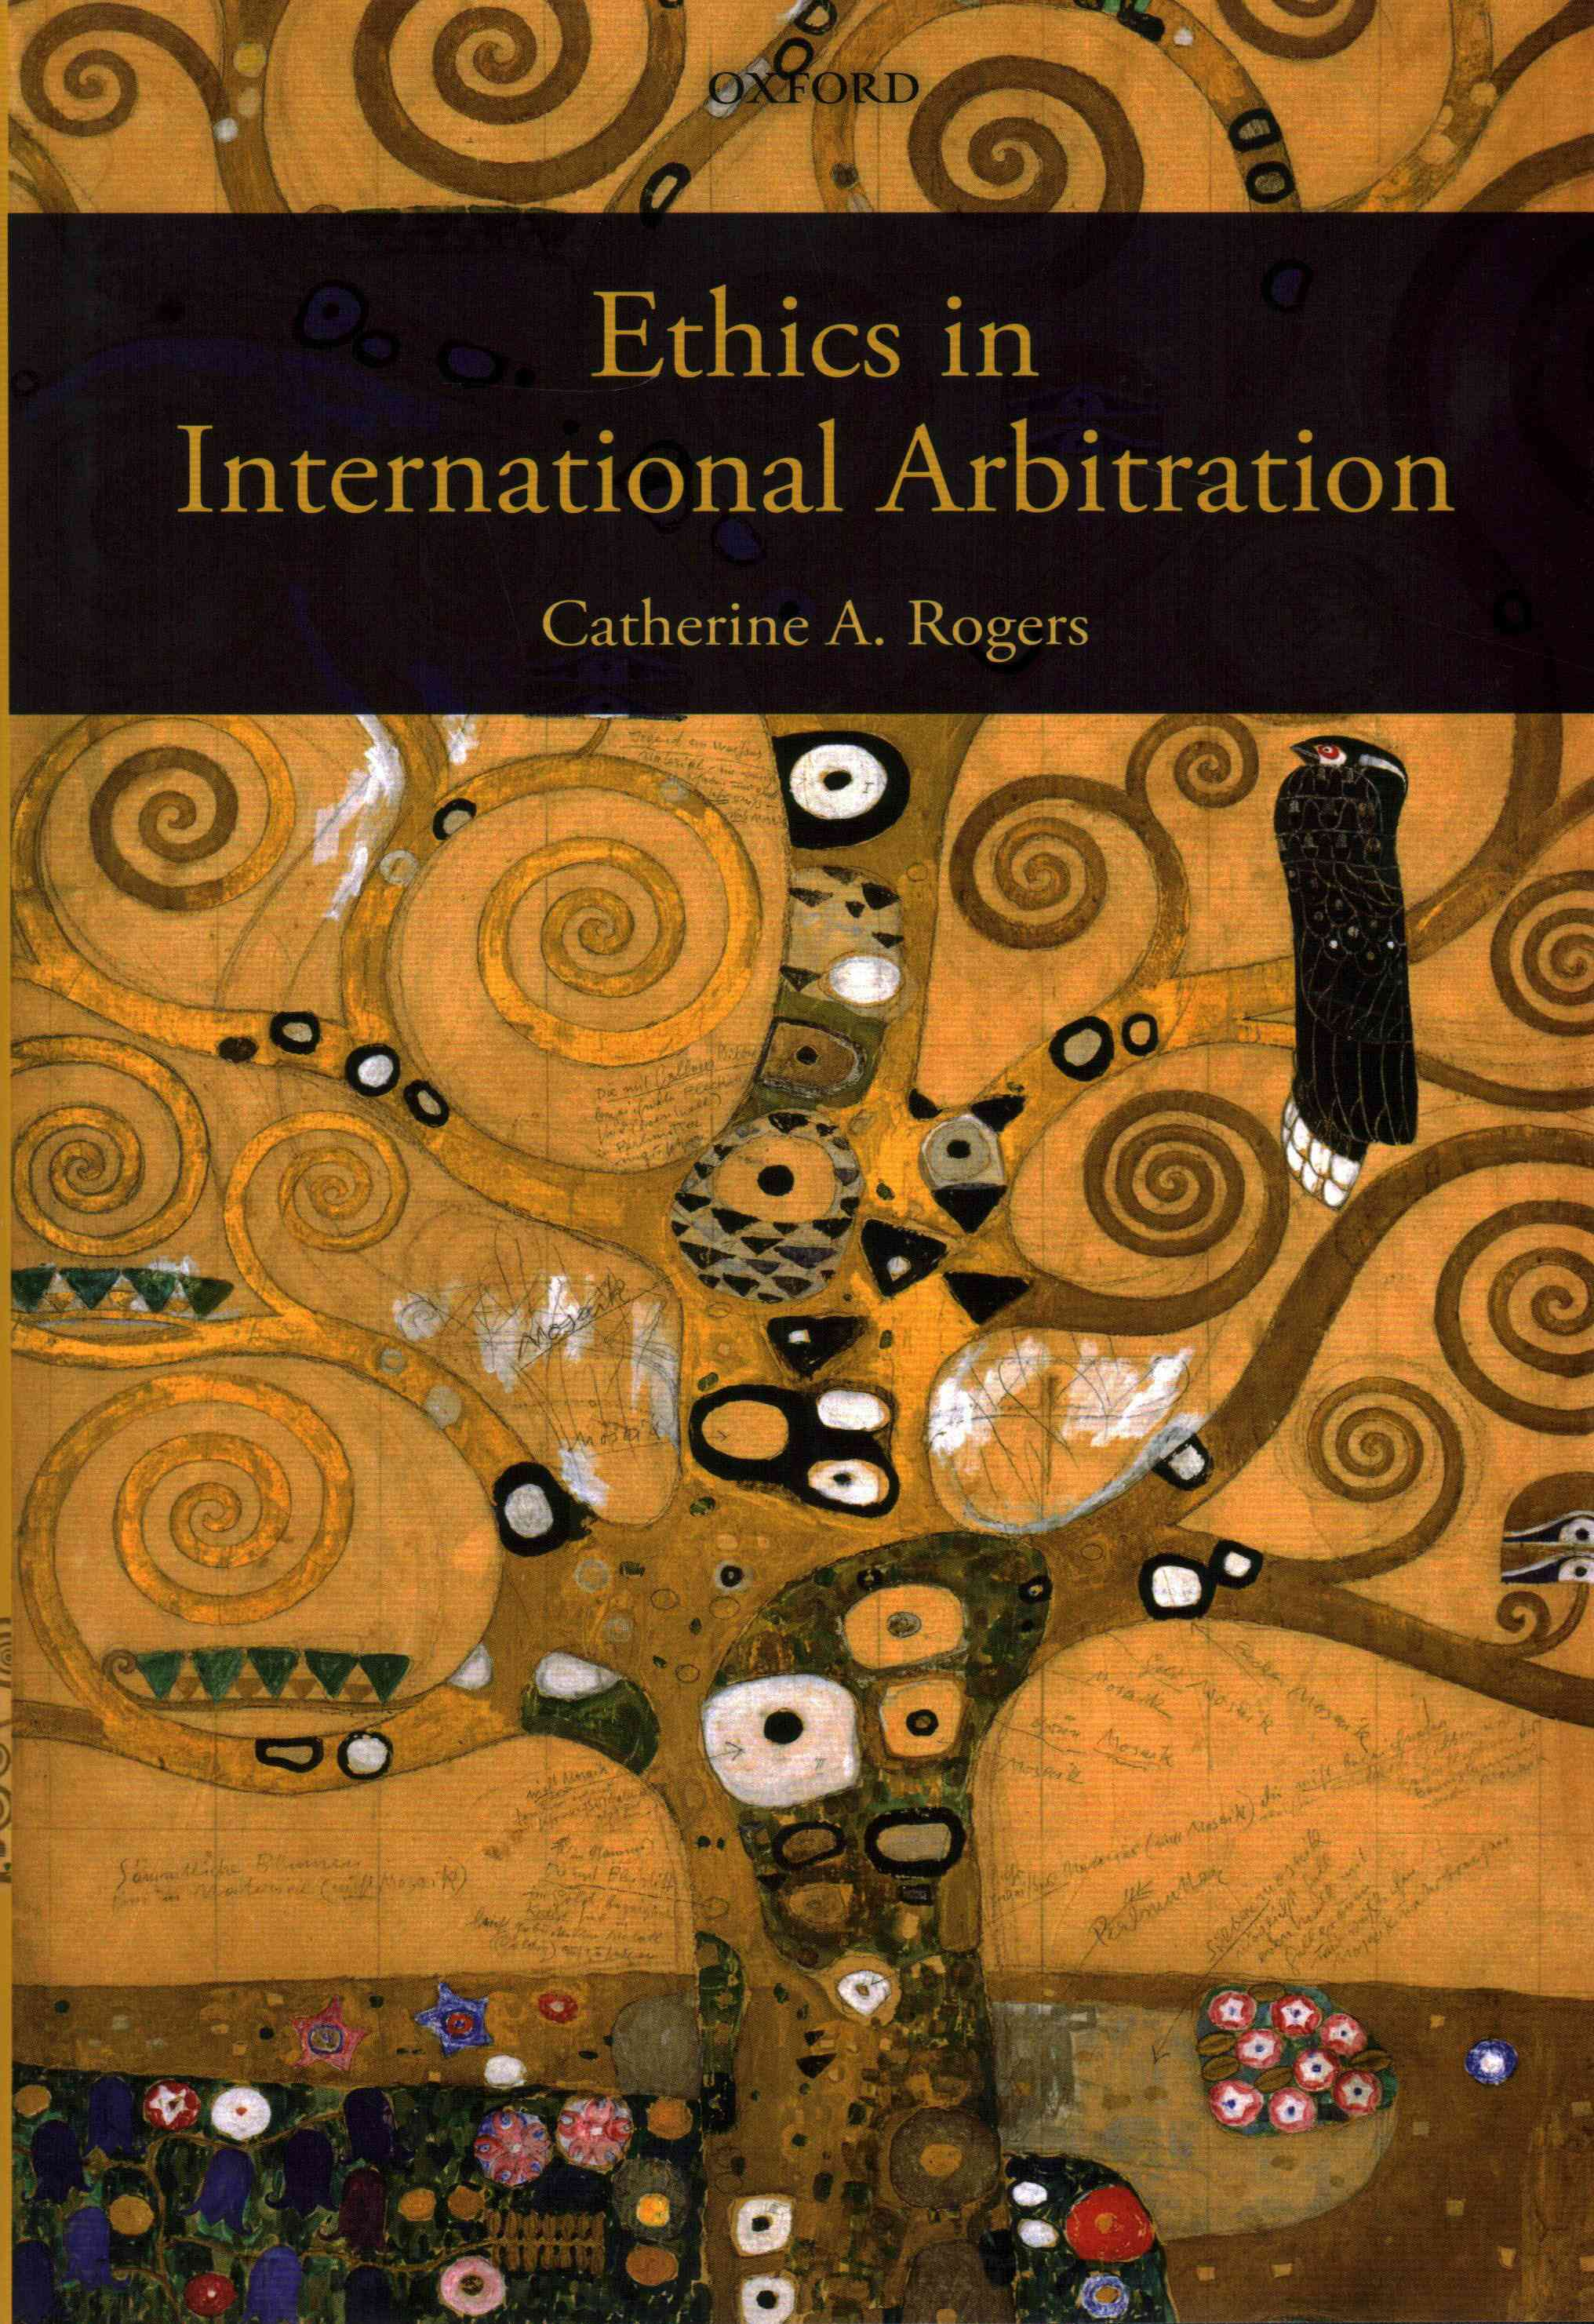 Ethics in International Arbitration (Hardcover)